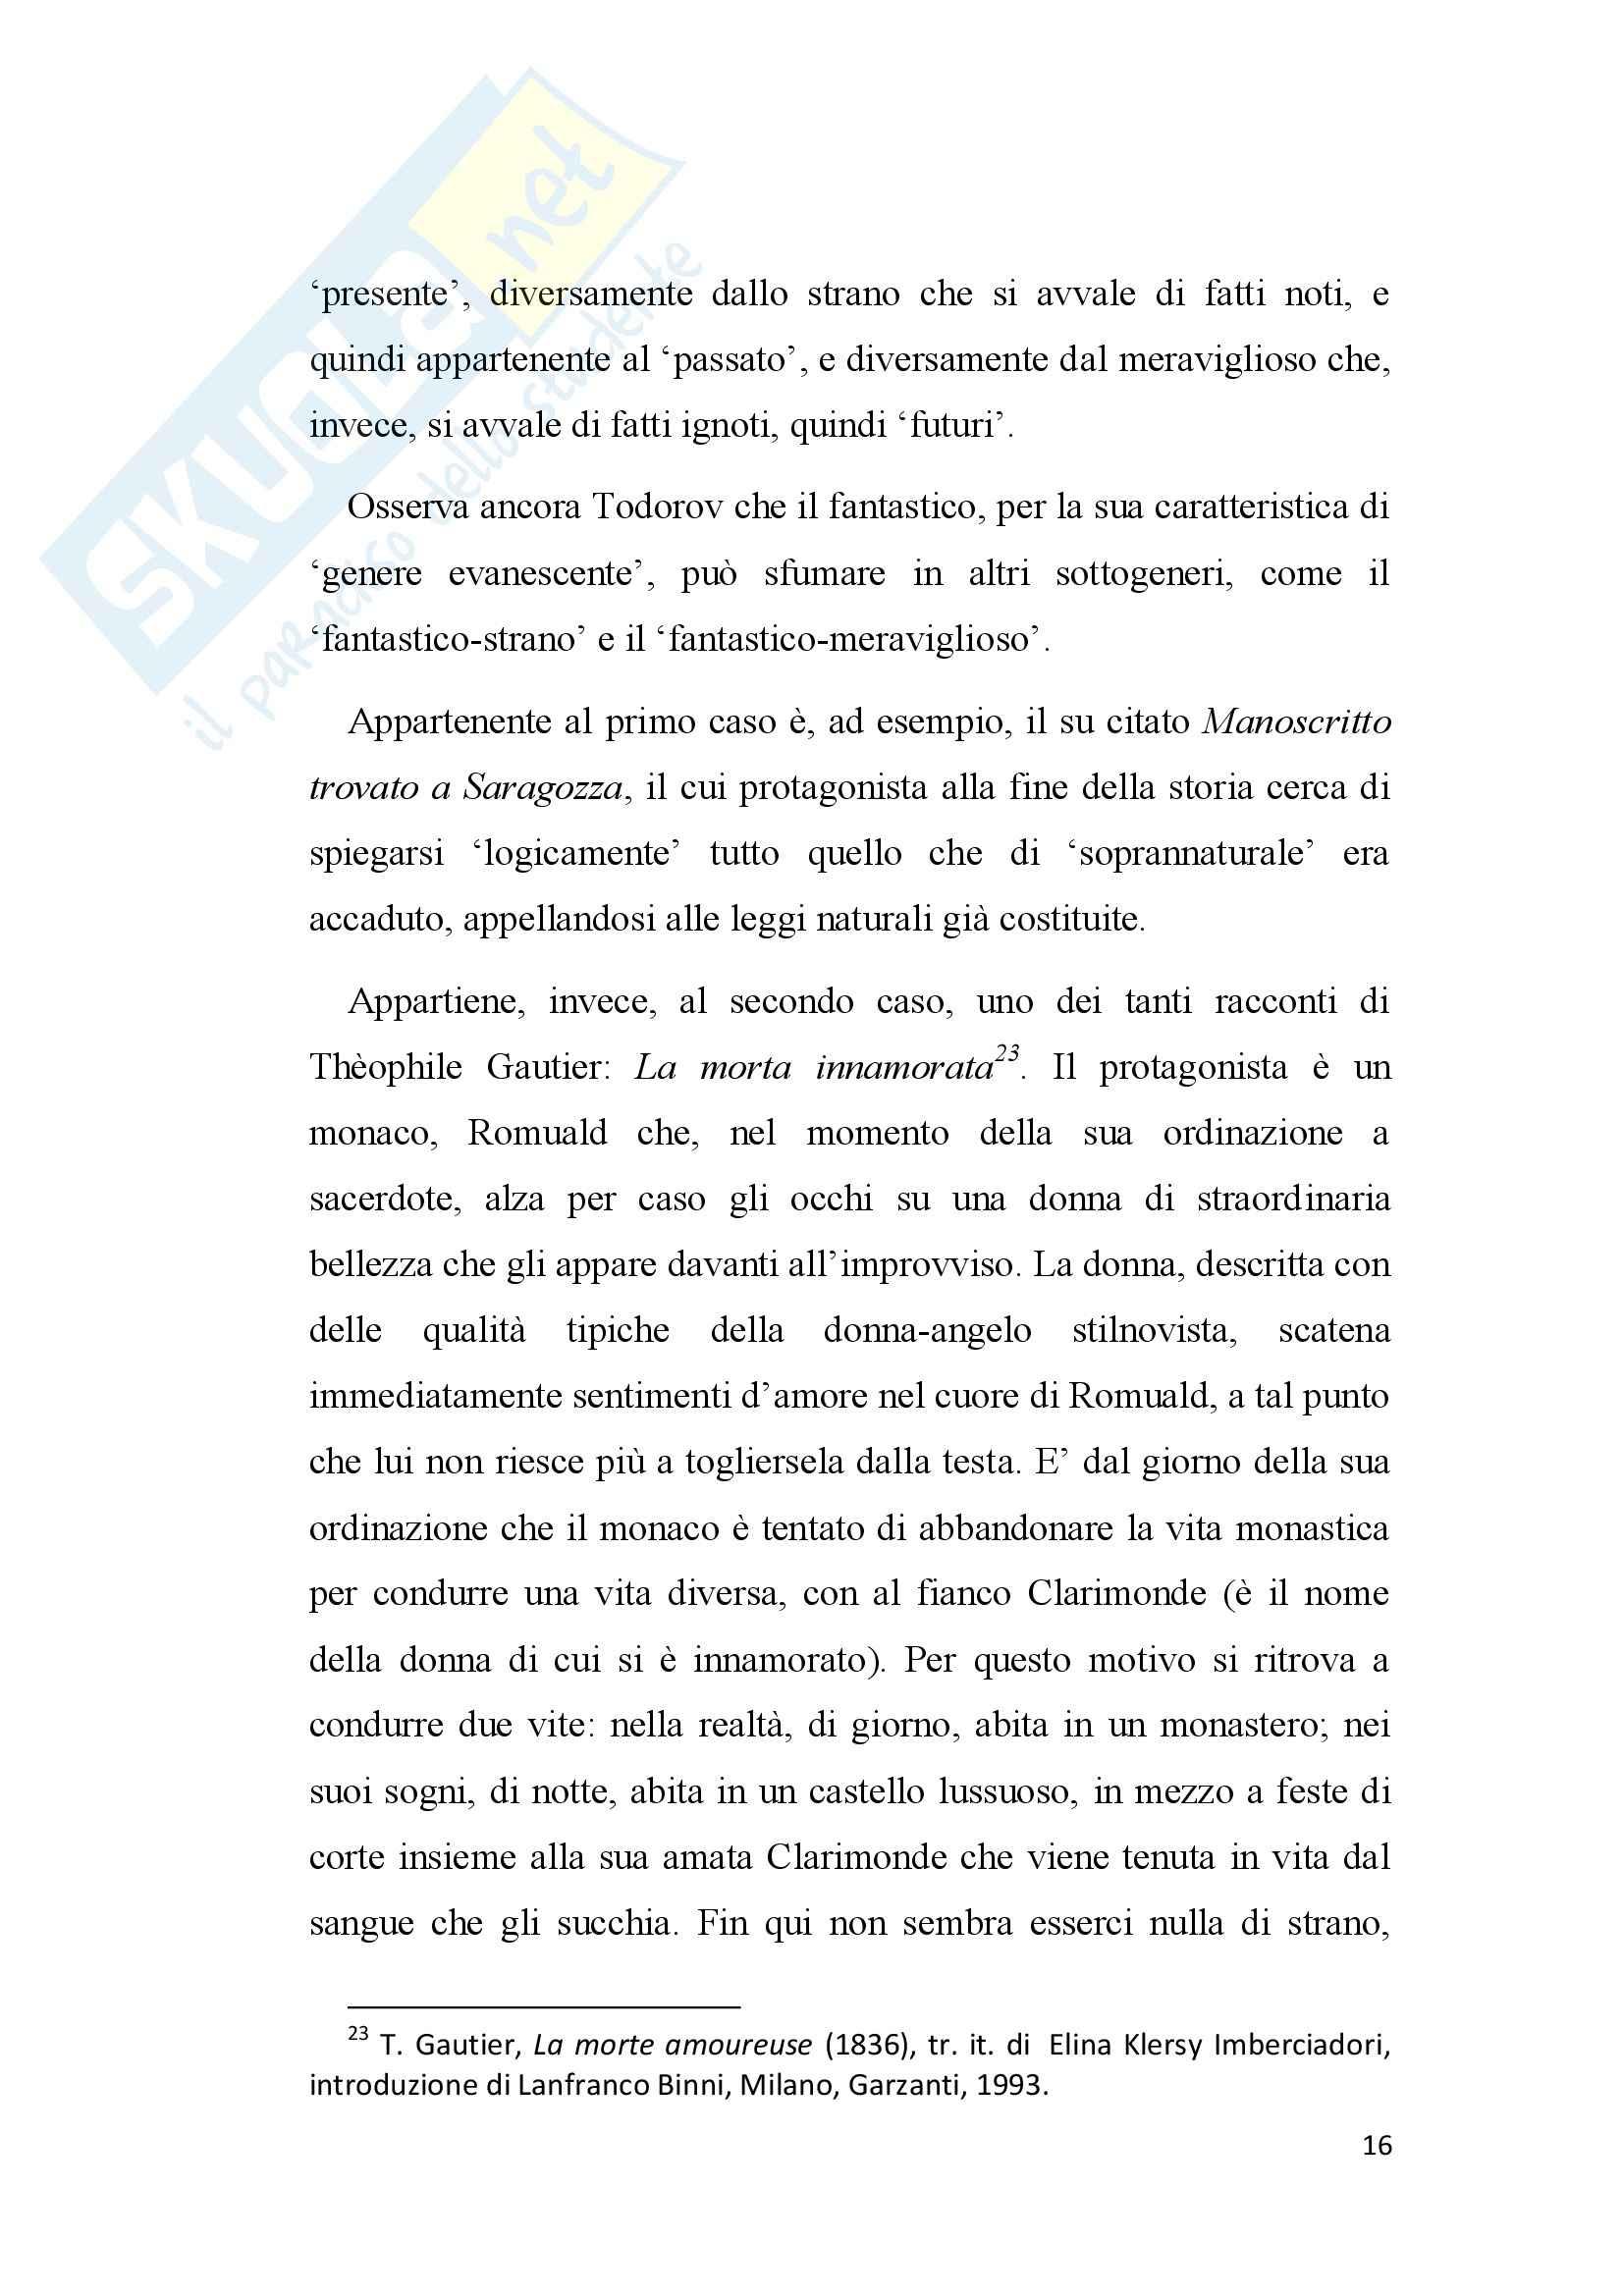 Tesi - Italo Calvino e il fantastico Pag. 16